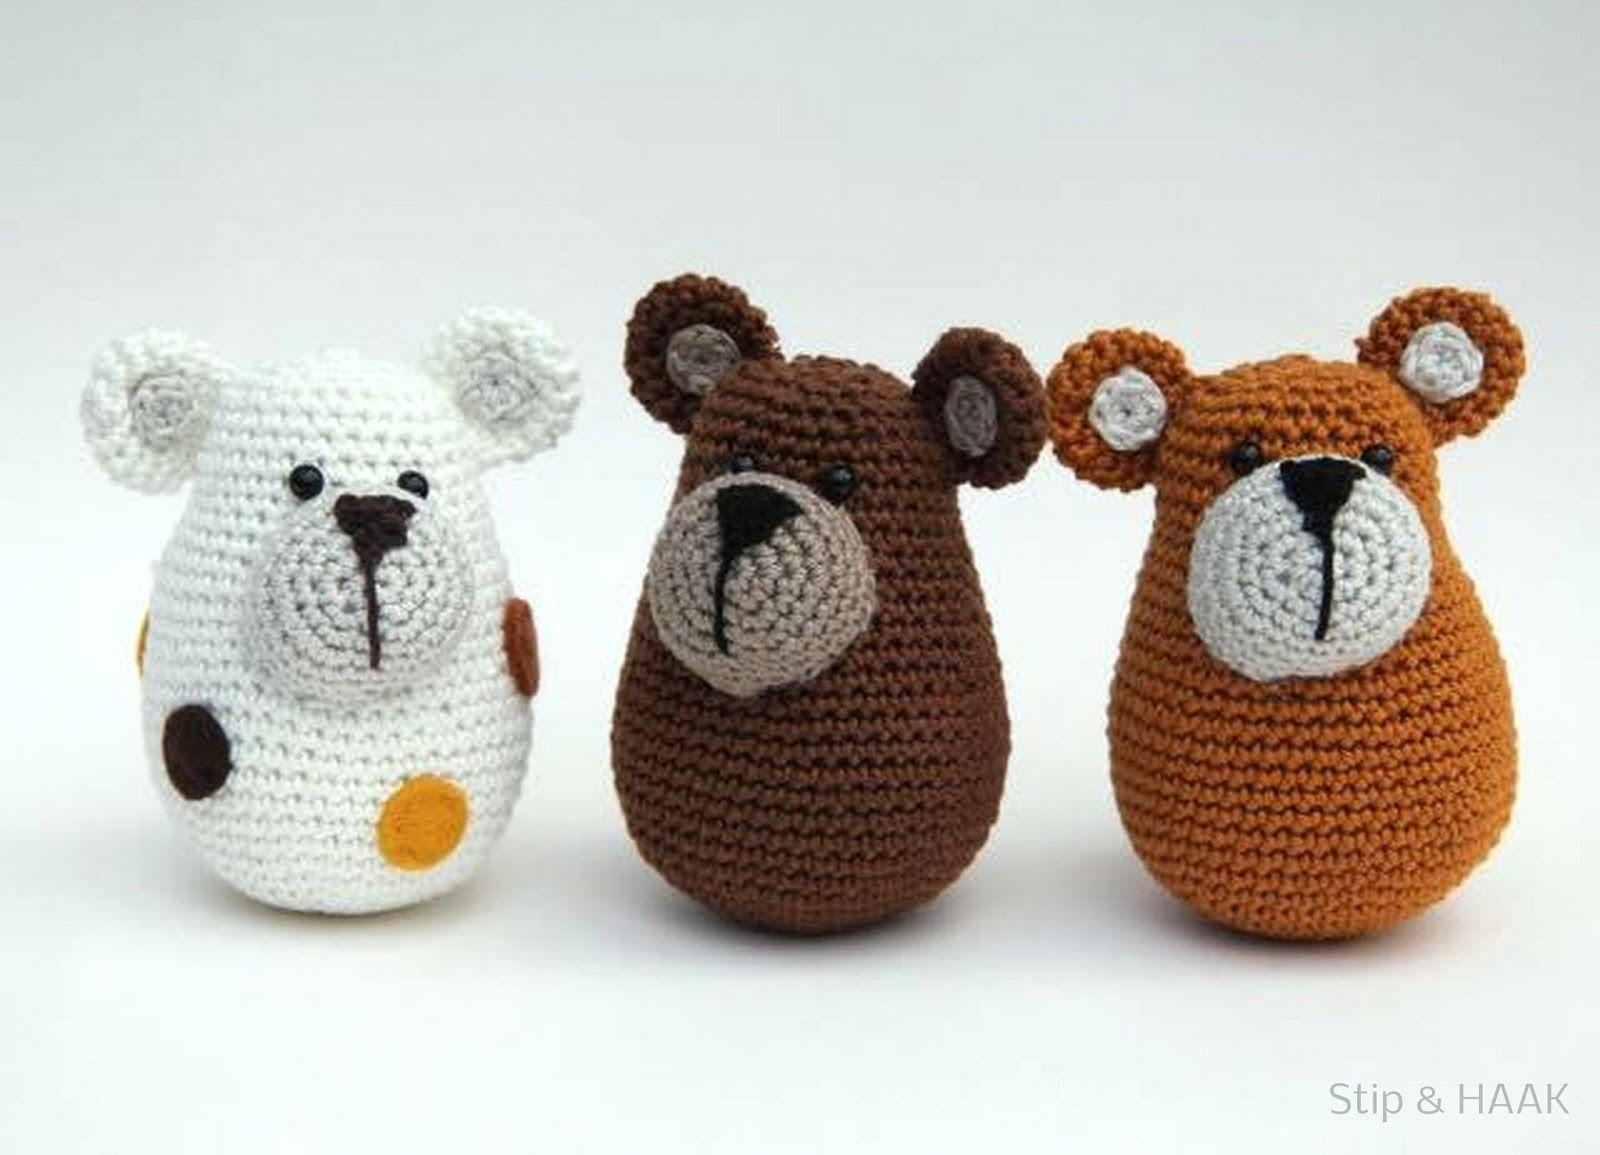 Stip & HAAK: Gratis patronen | Crochet Animals/Dolls/Puppets ...